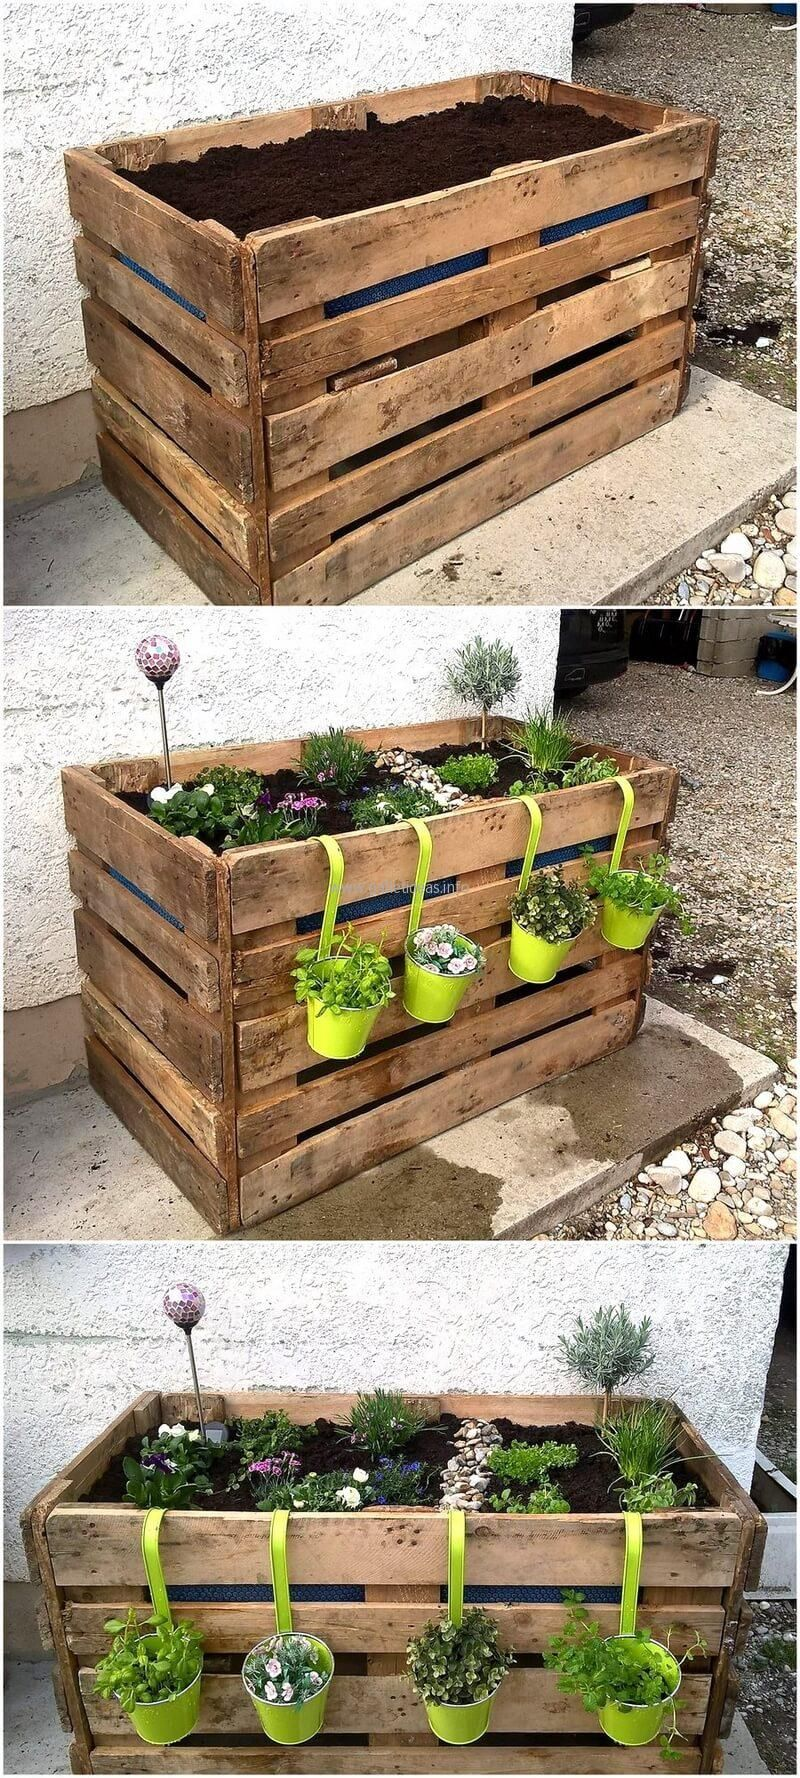 Diy Pallet Planter Ideas Rustic Garden